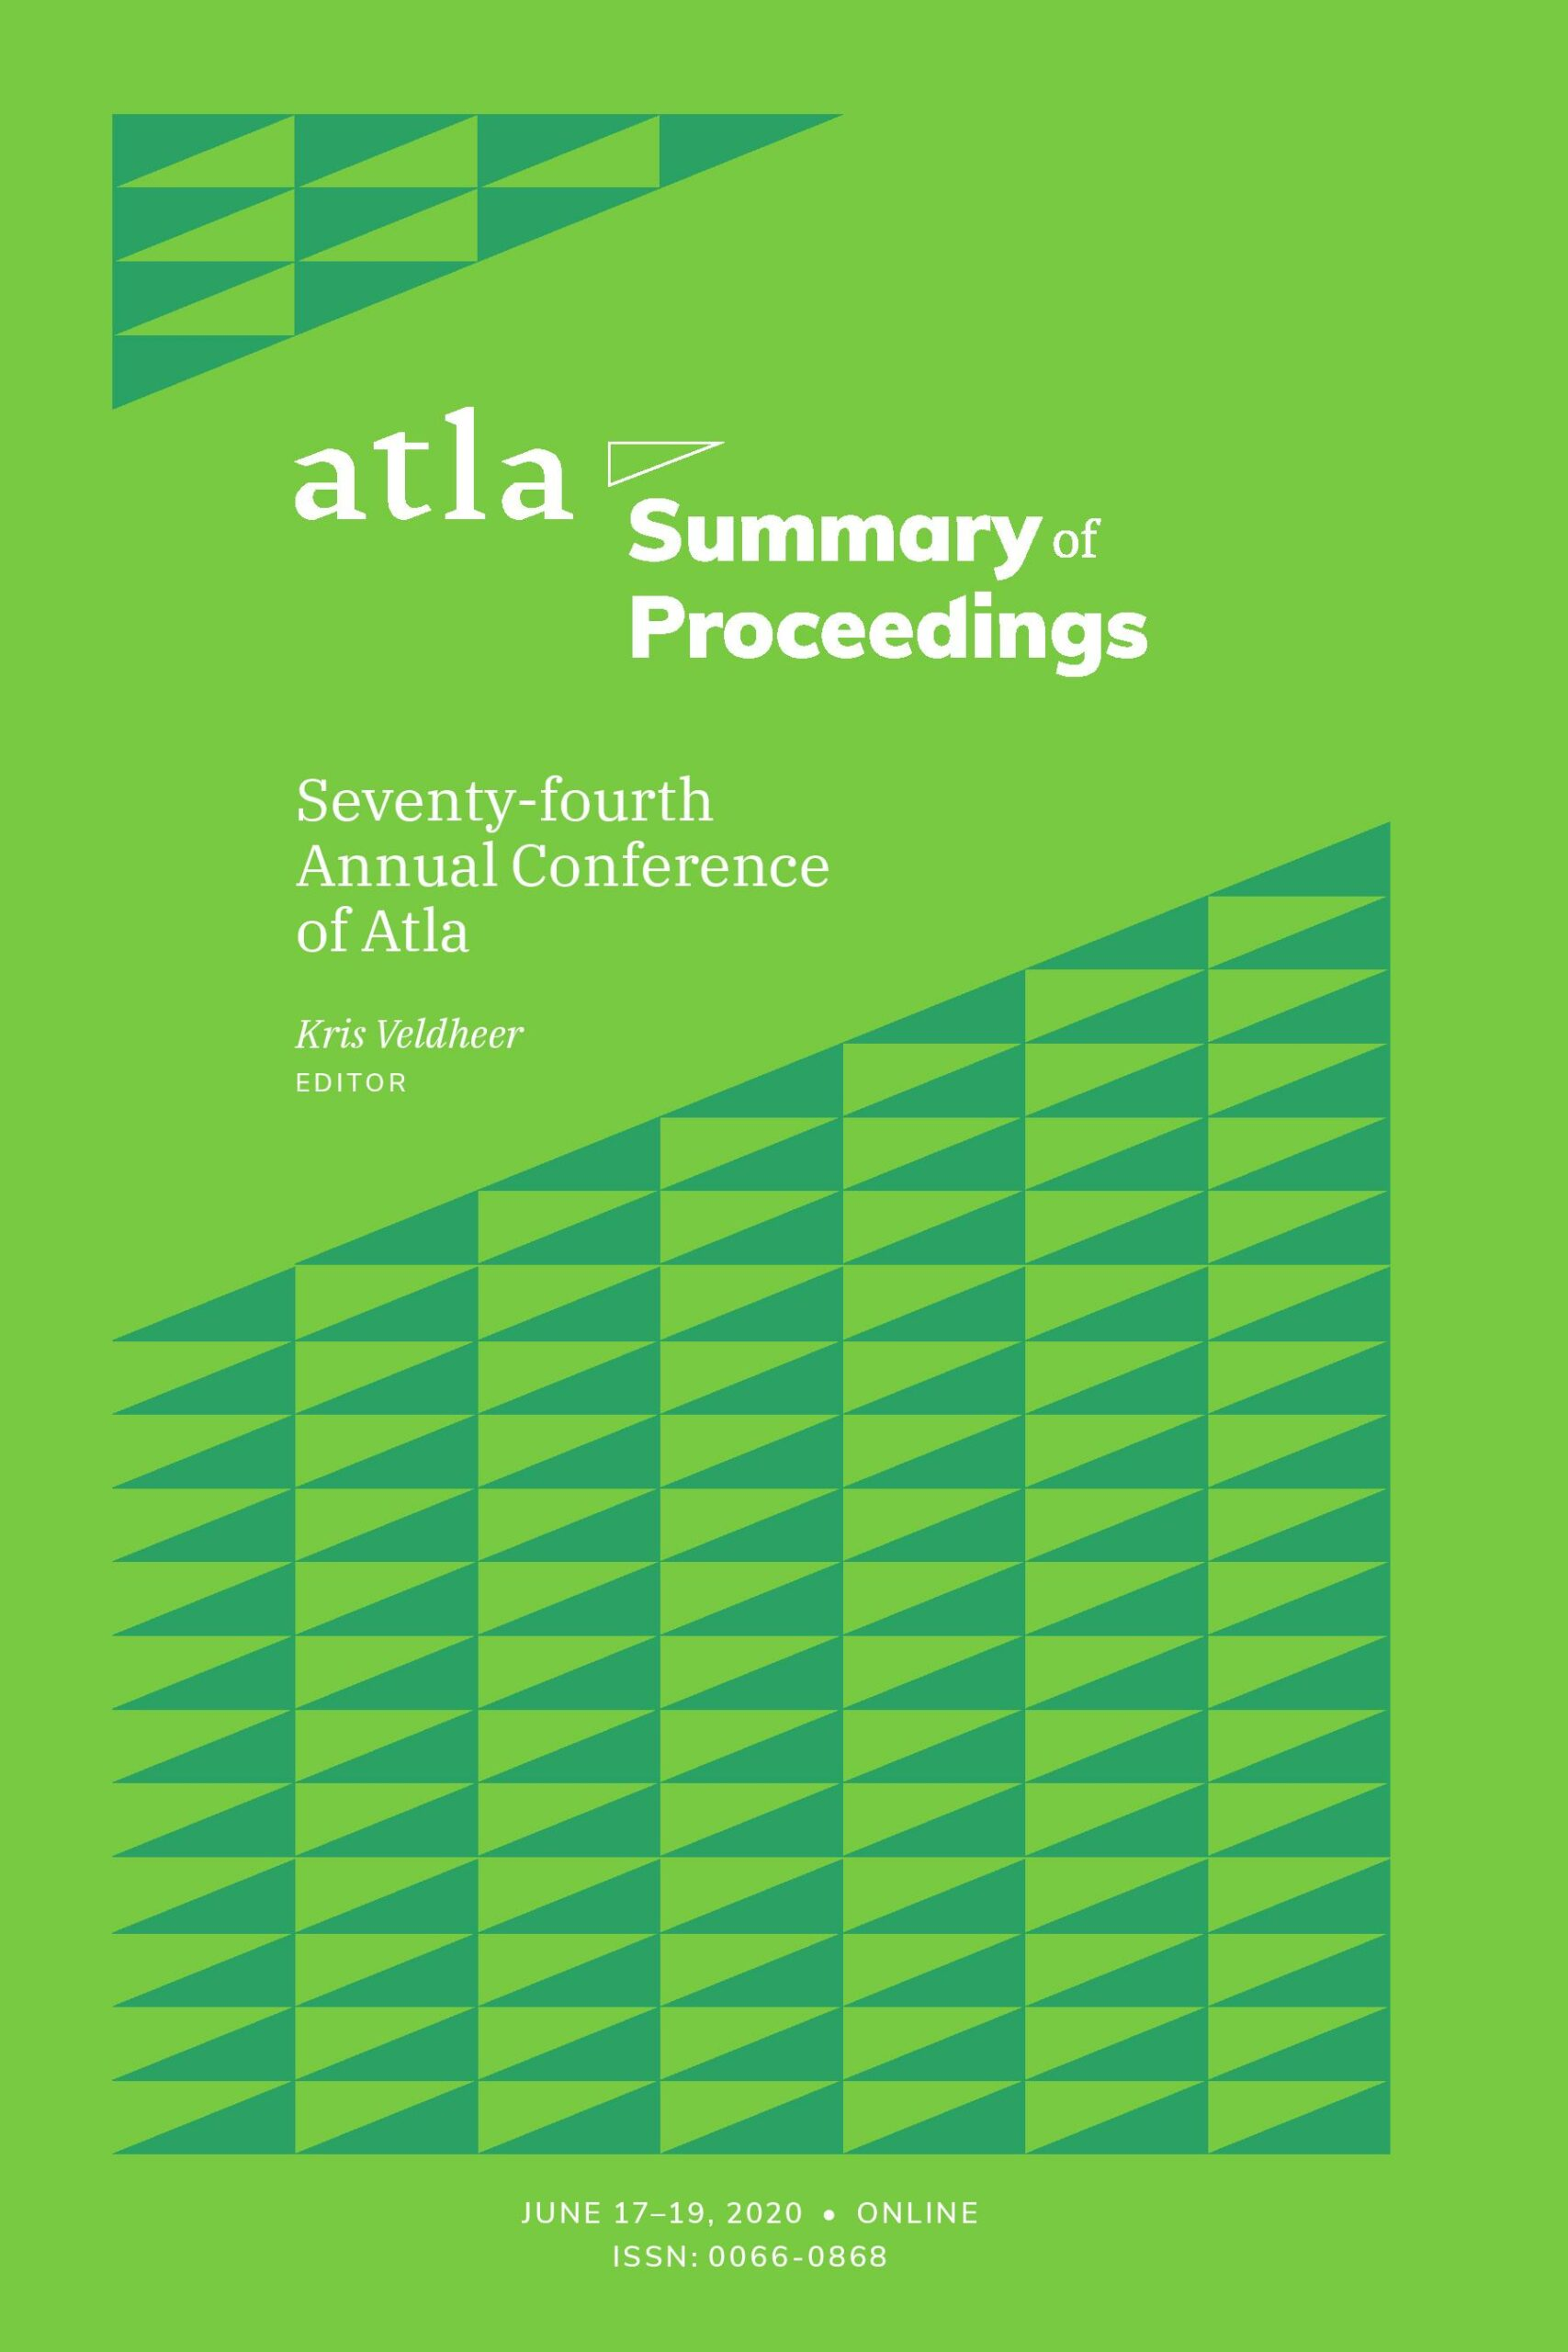 Summary of Proceedings 2020